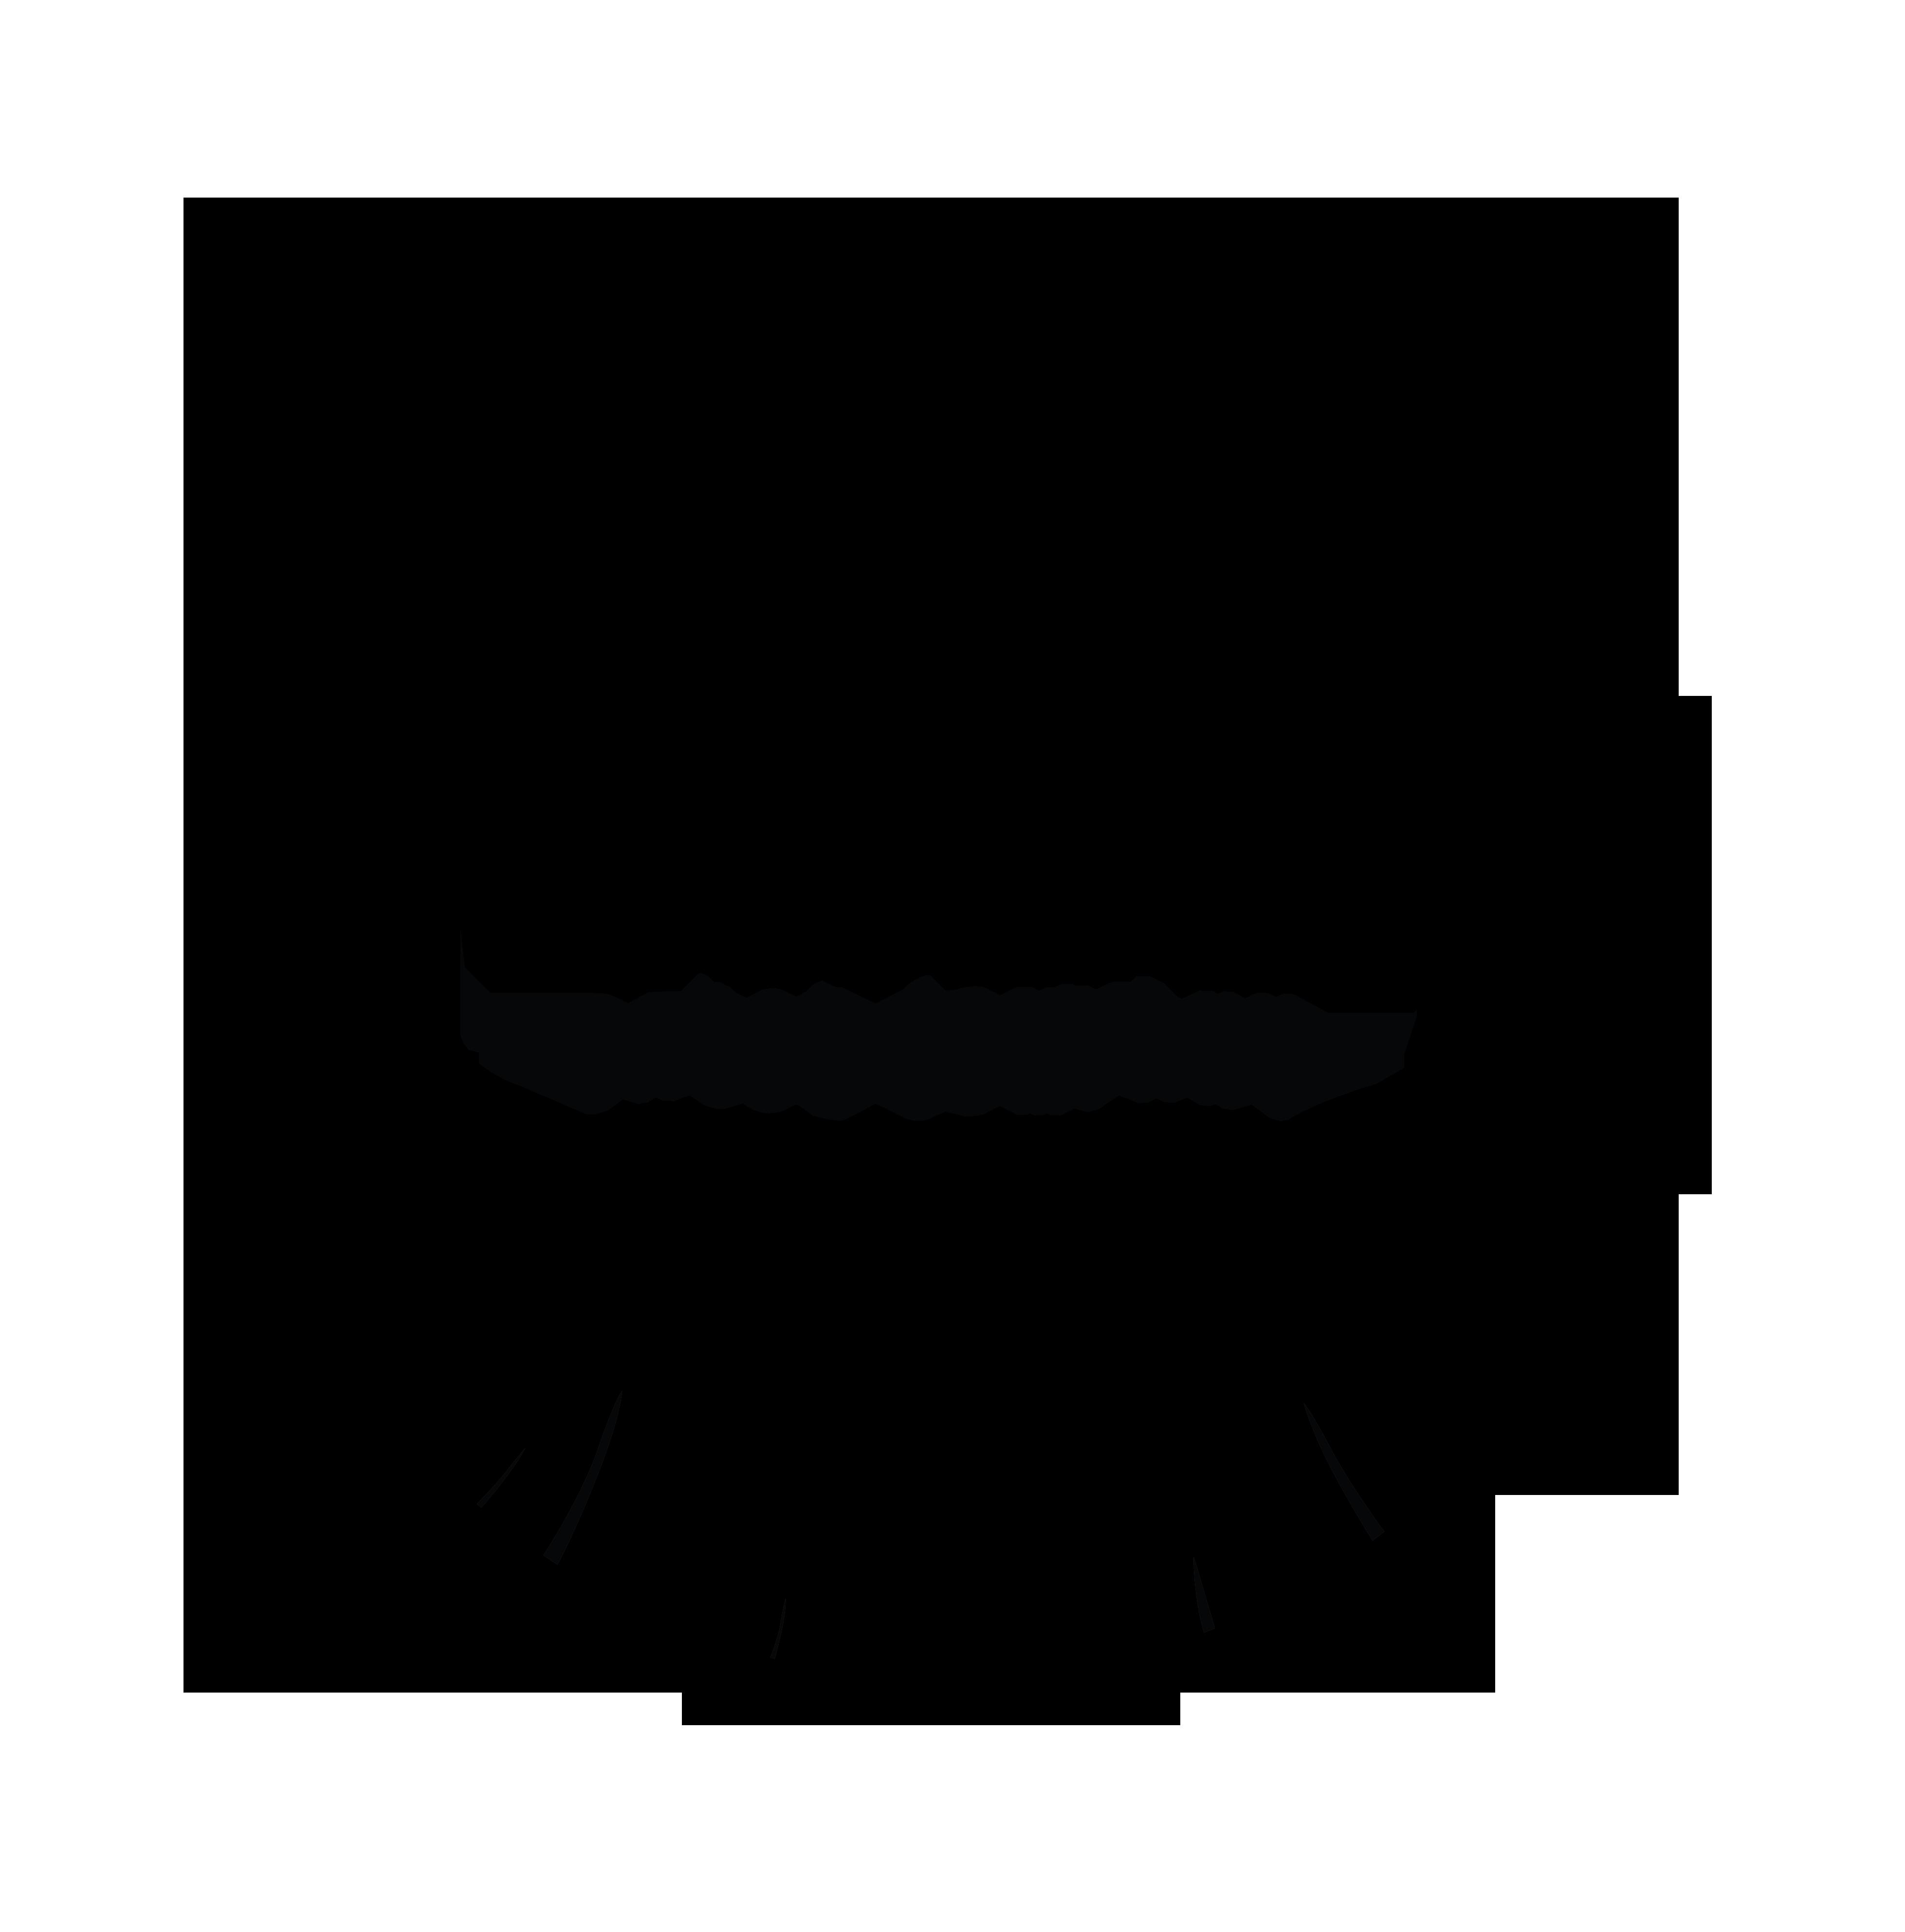 A Frame Logo in circle